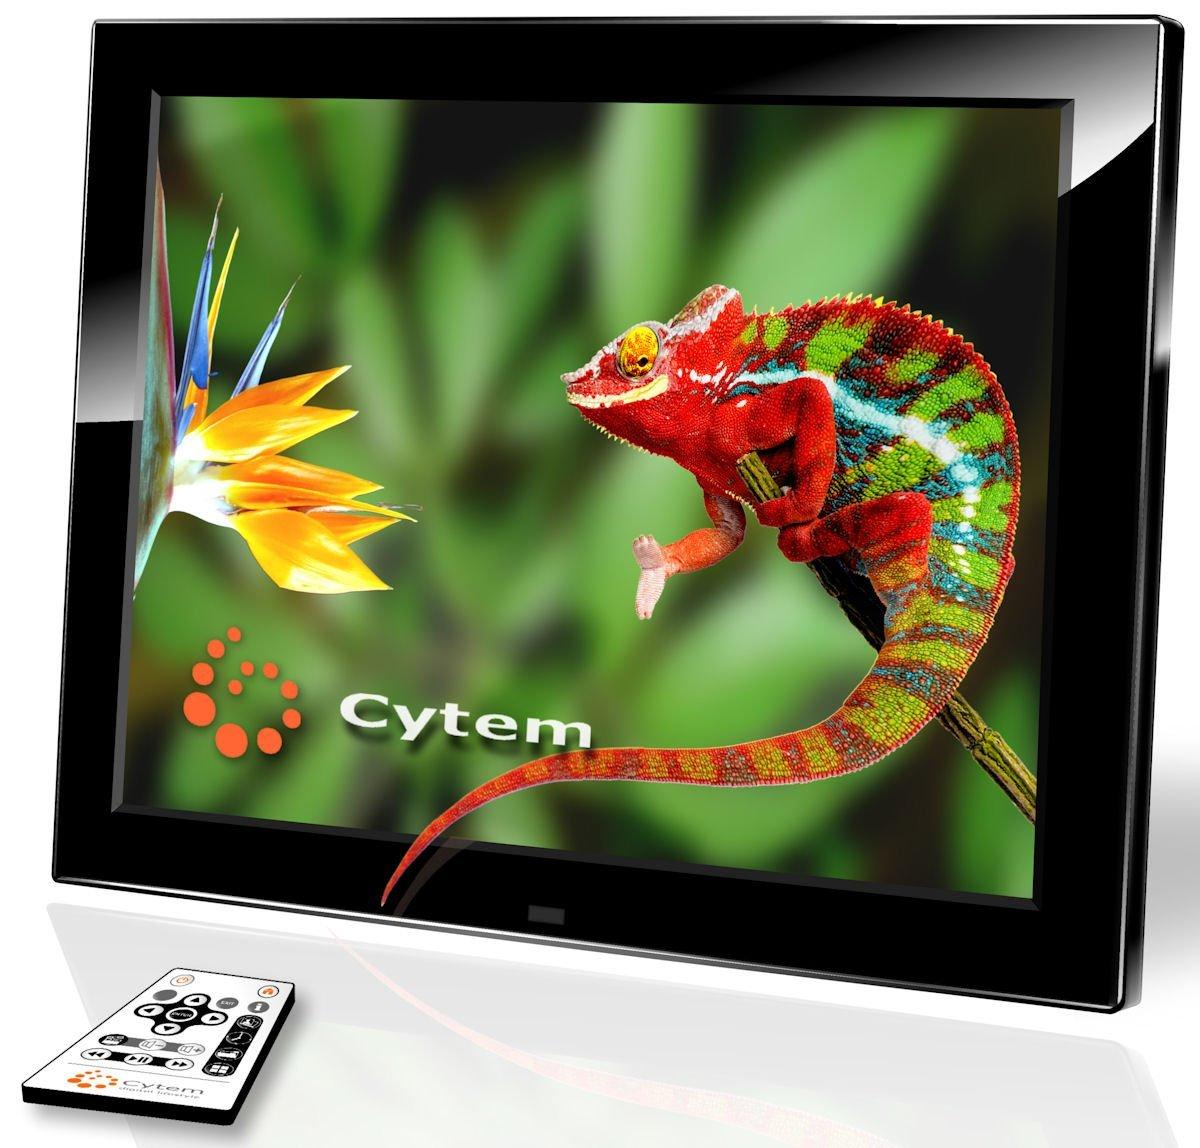 Wunderbar Video Digitalrahmen Ideen - Benutzerdefinierte ...